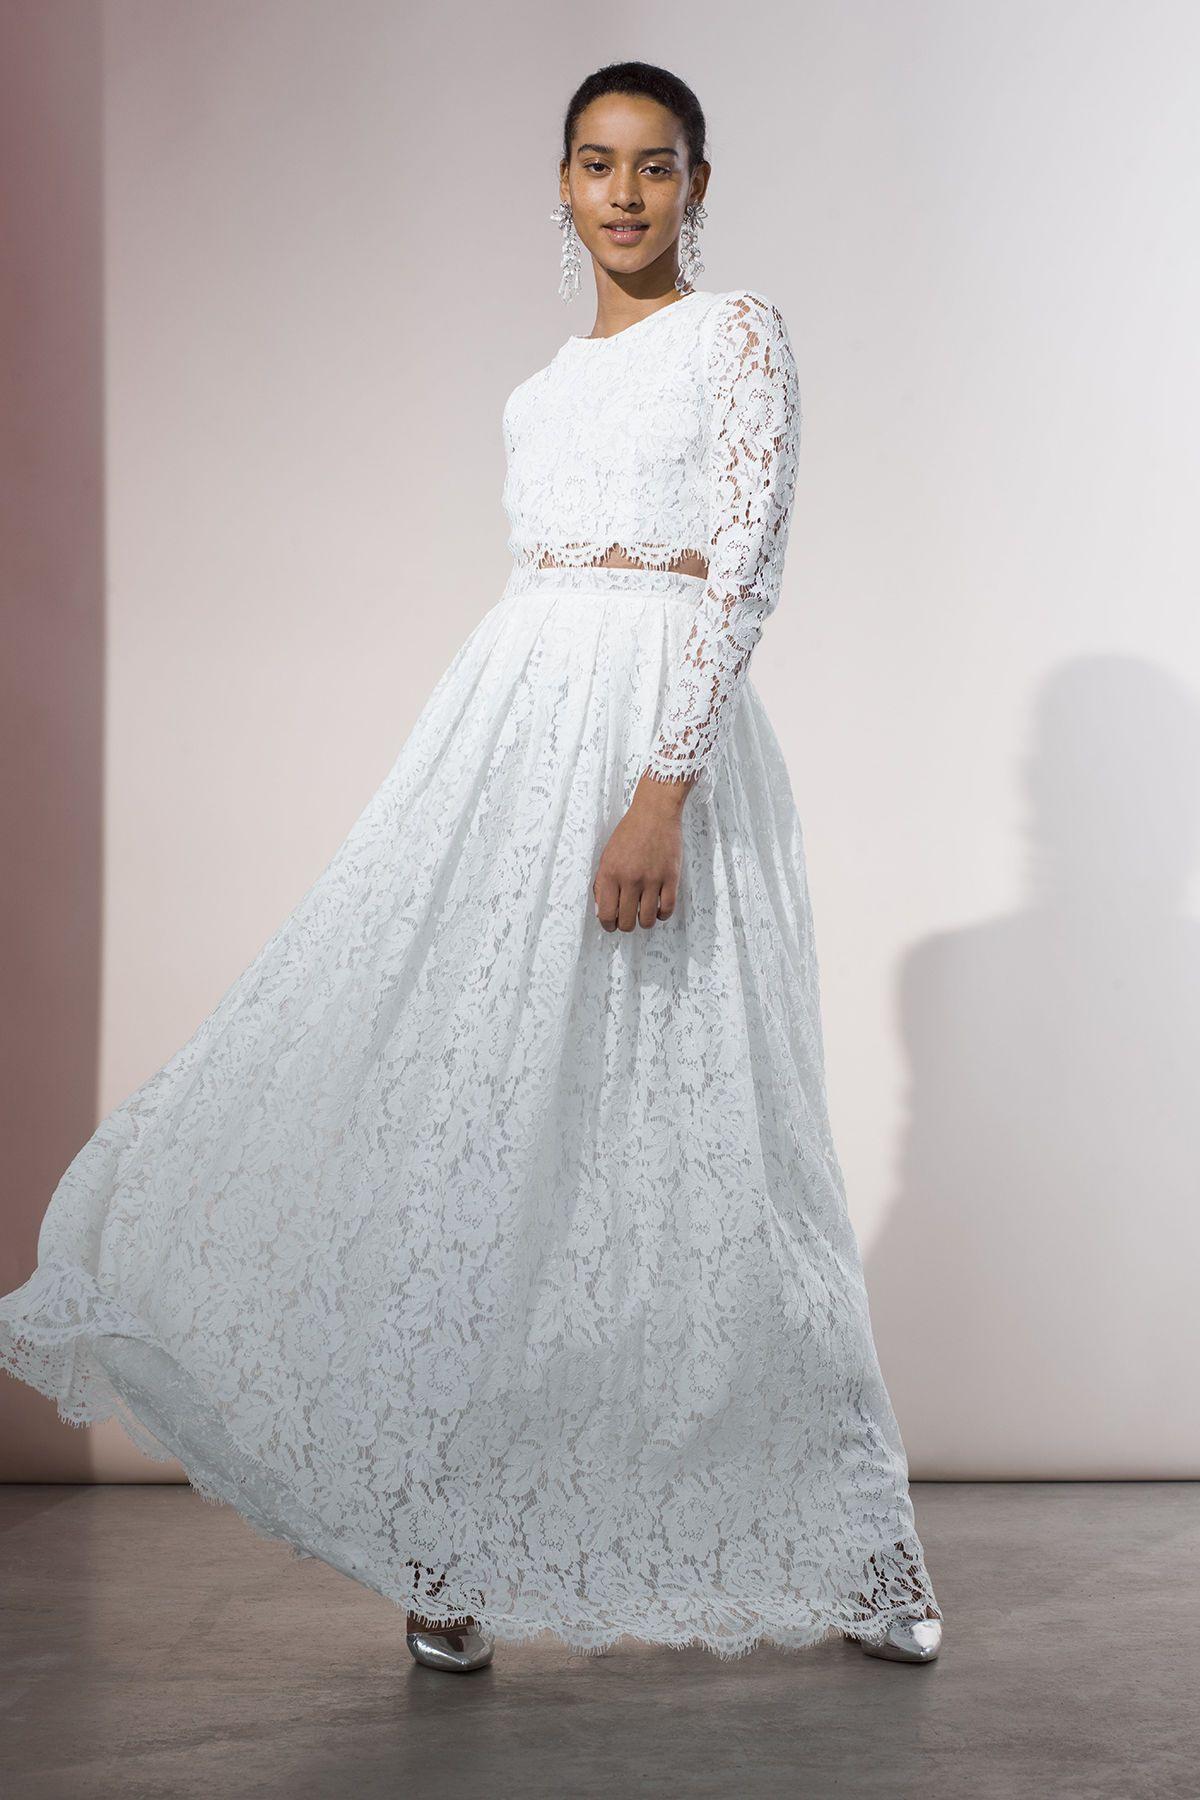 Asos Bridal 2018 Die Neue Kollektion Ist Da  Wedding